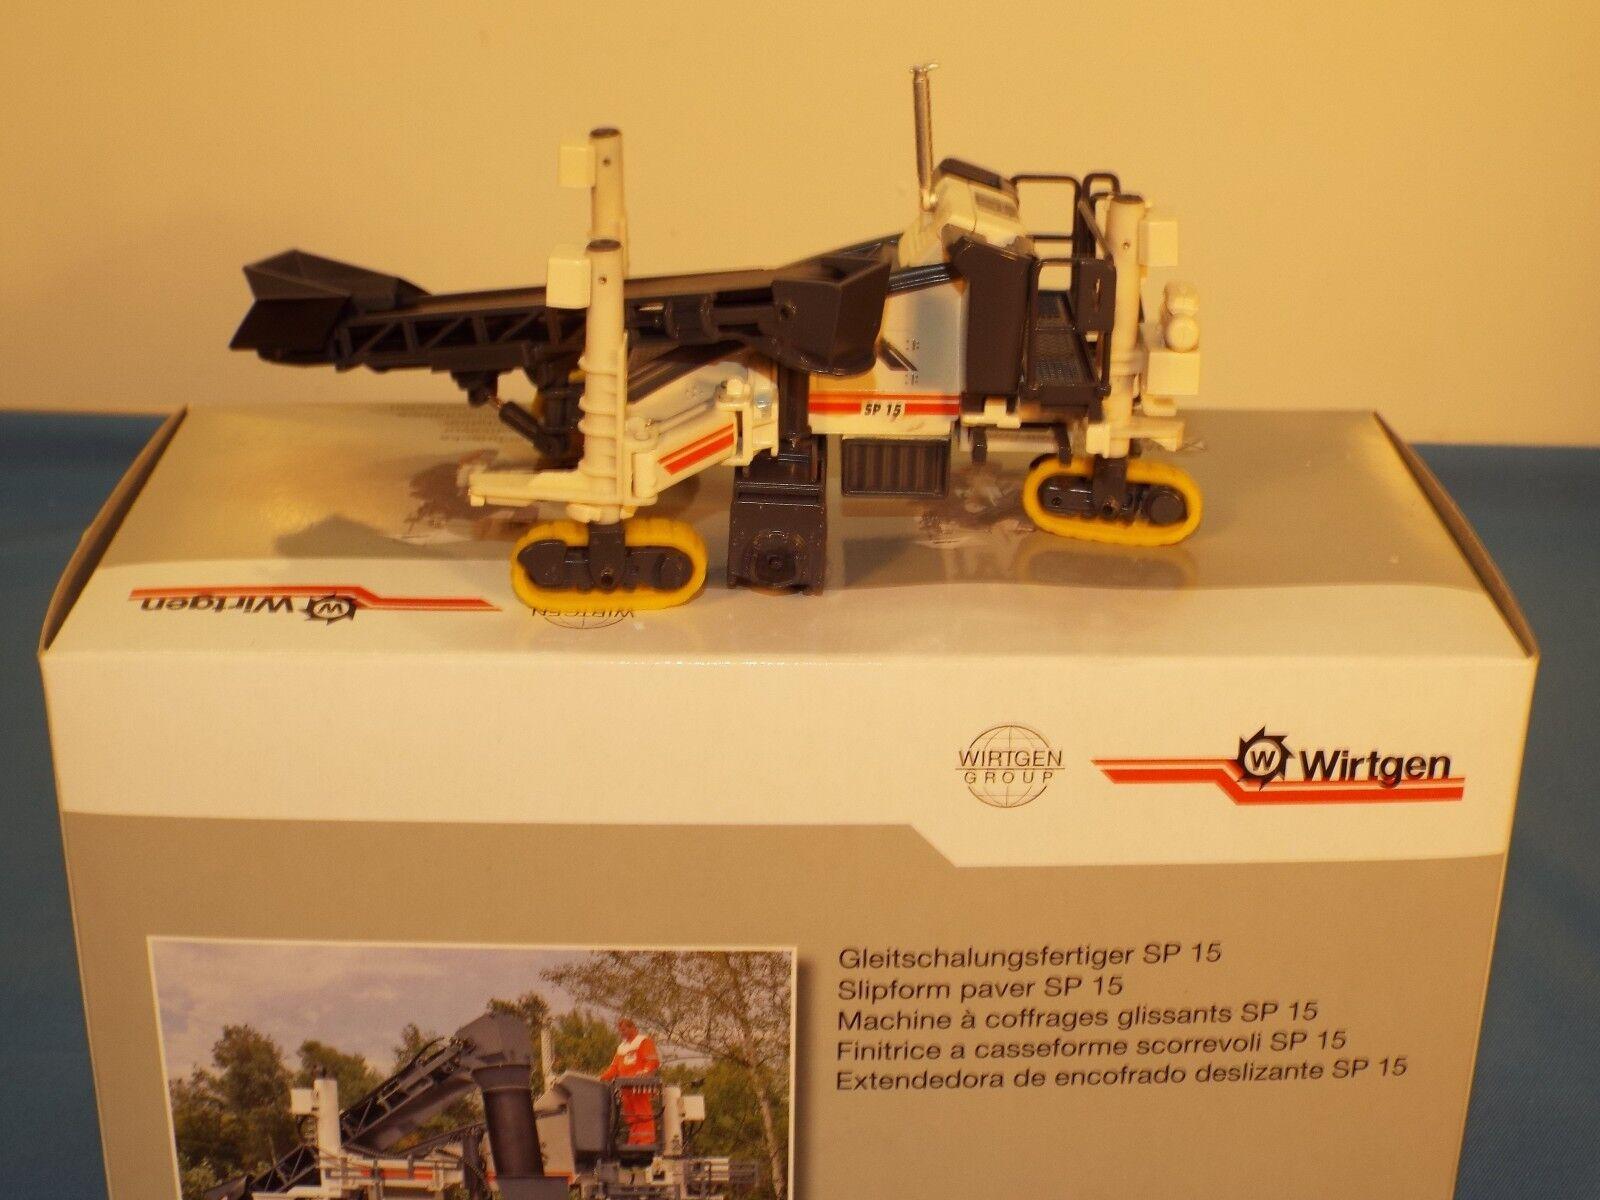 NZG No 8071 Wirtgen SP15 Slipform Paver ( Belt feed) New